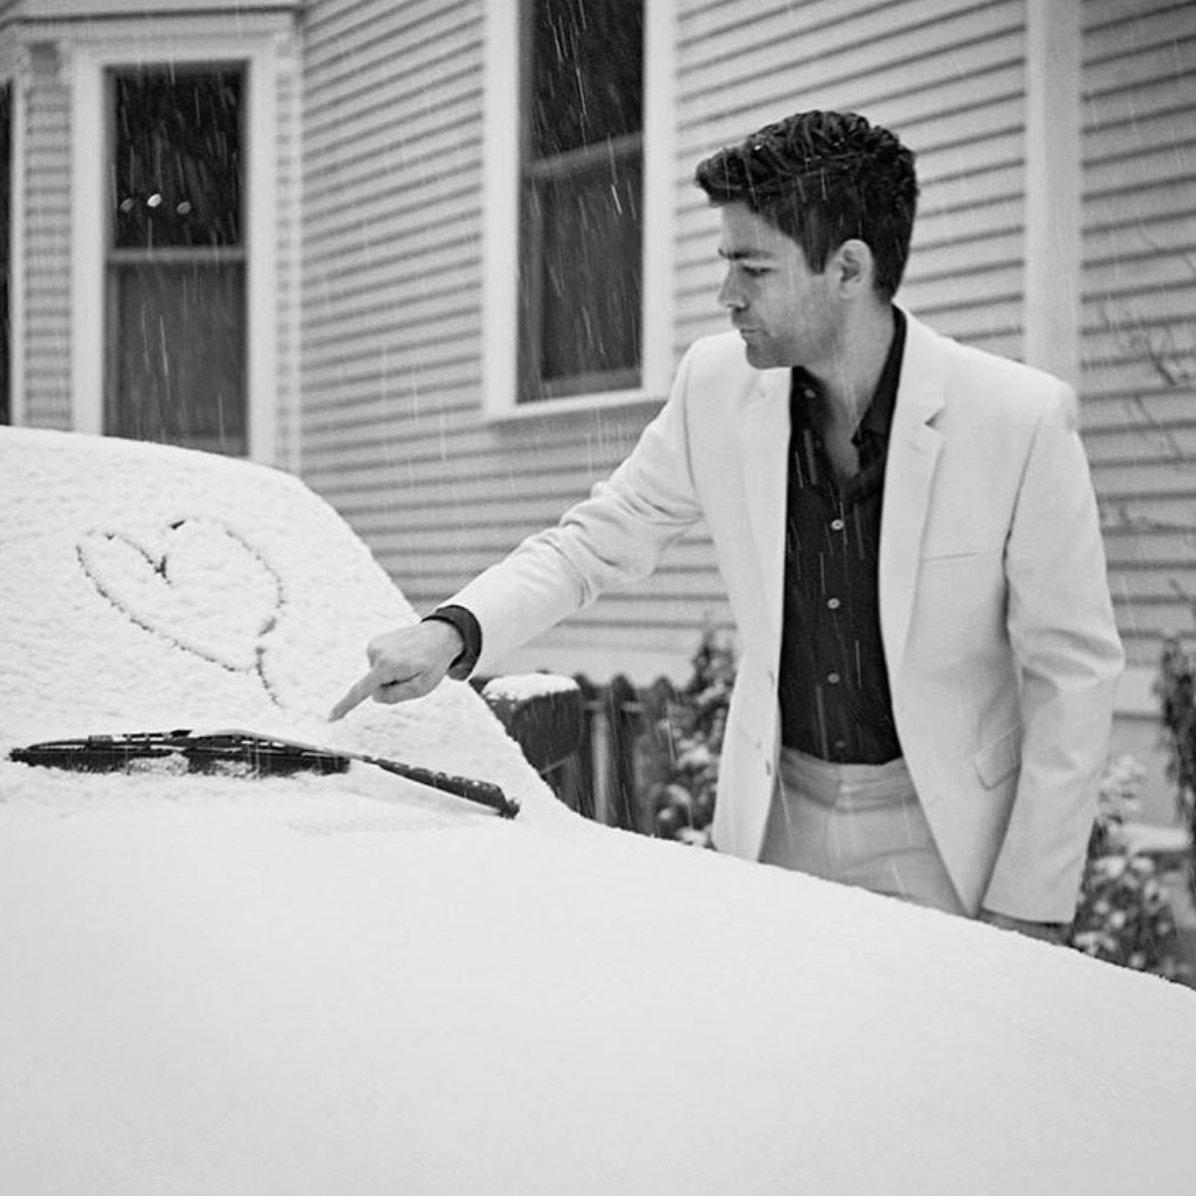 I ❤️ u snow...now go away. It's time for spring, please. #spring   ???? @davidjweiner https://t.co/BtjOTmkfsg